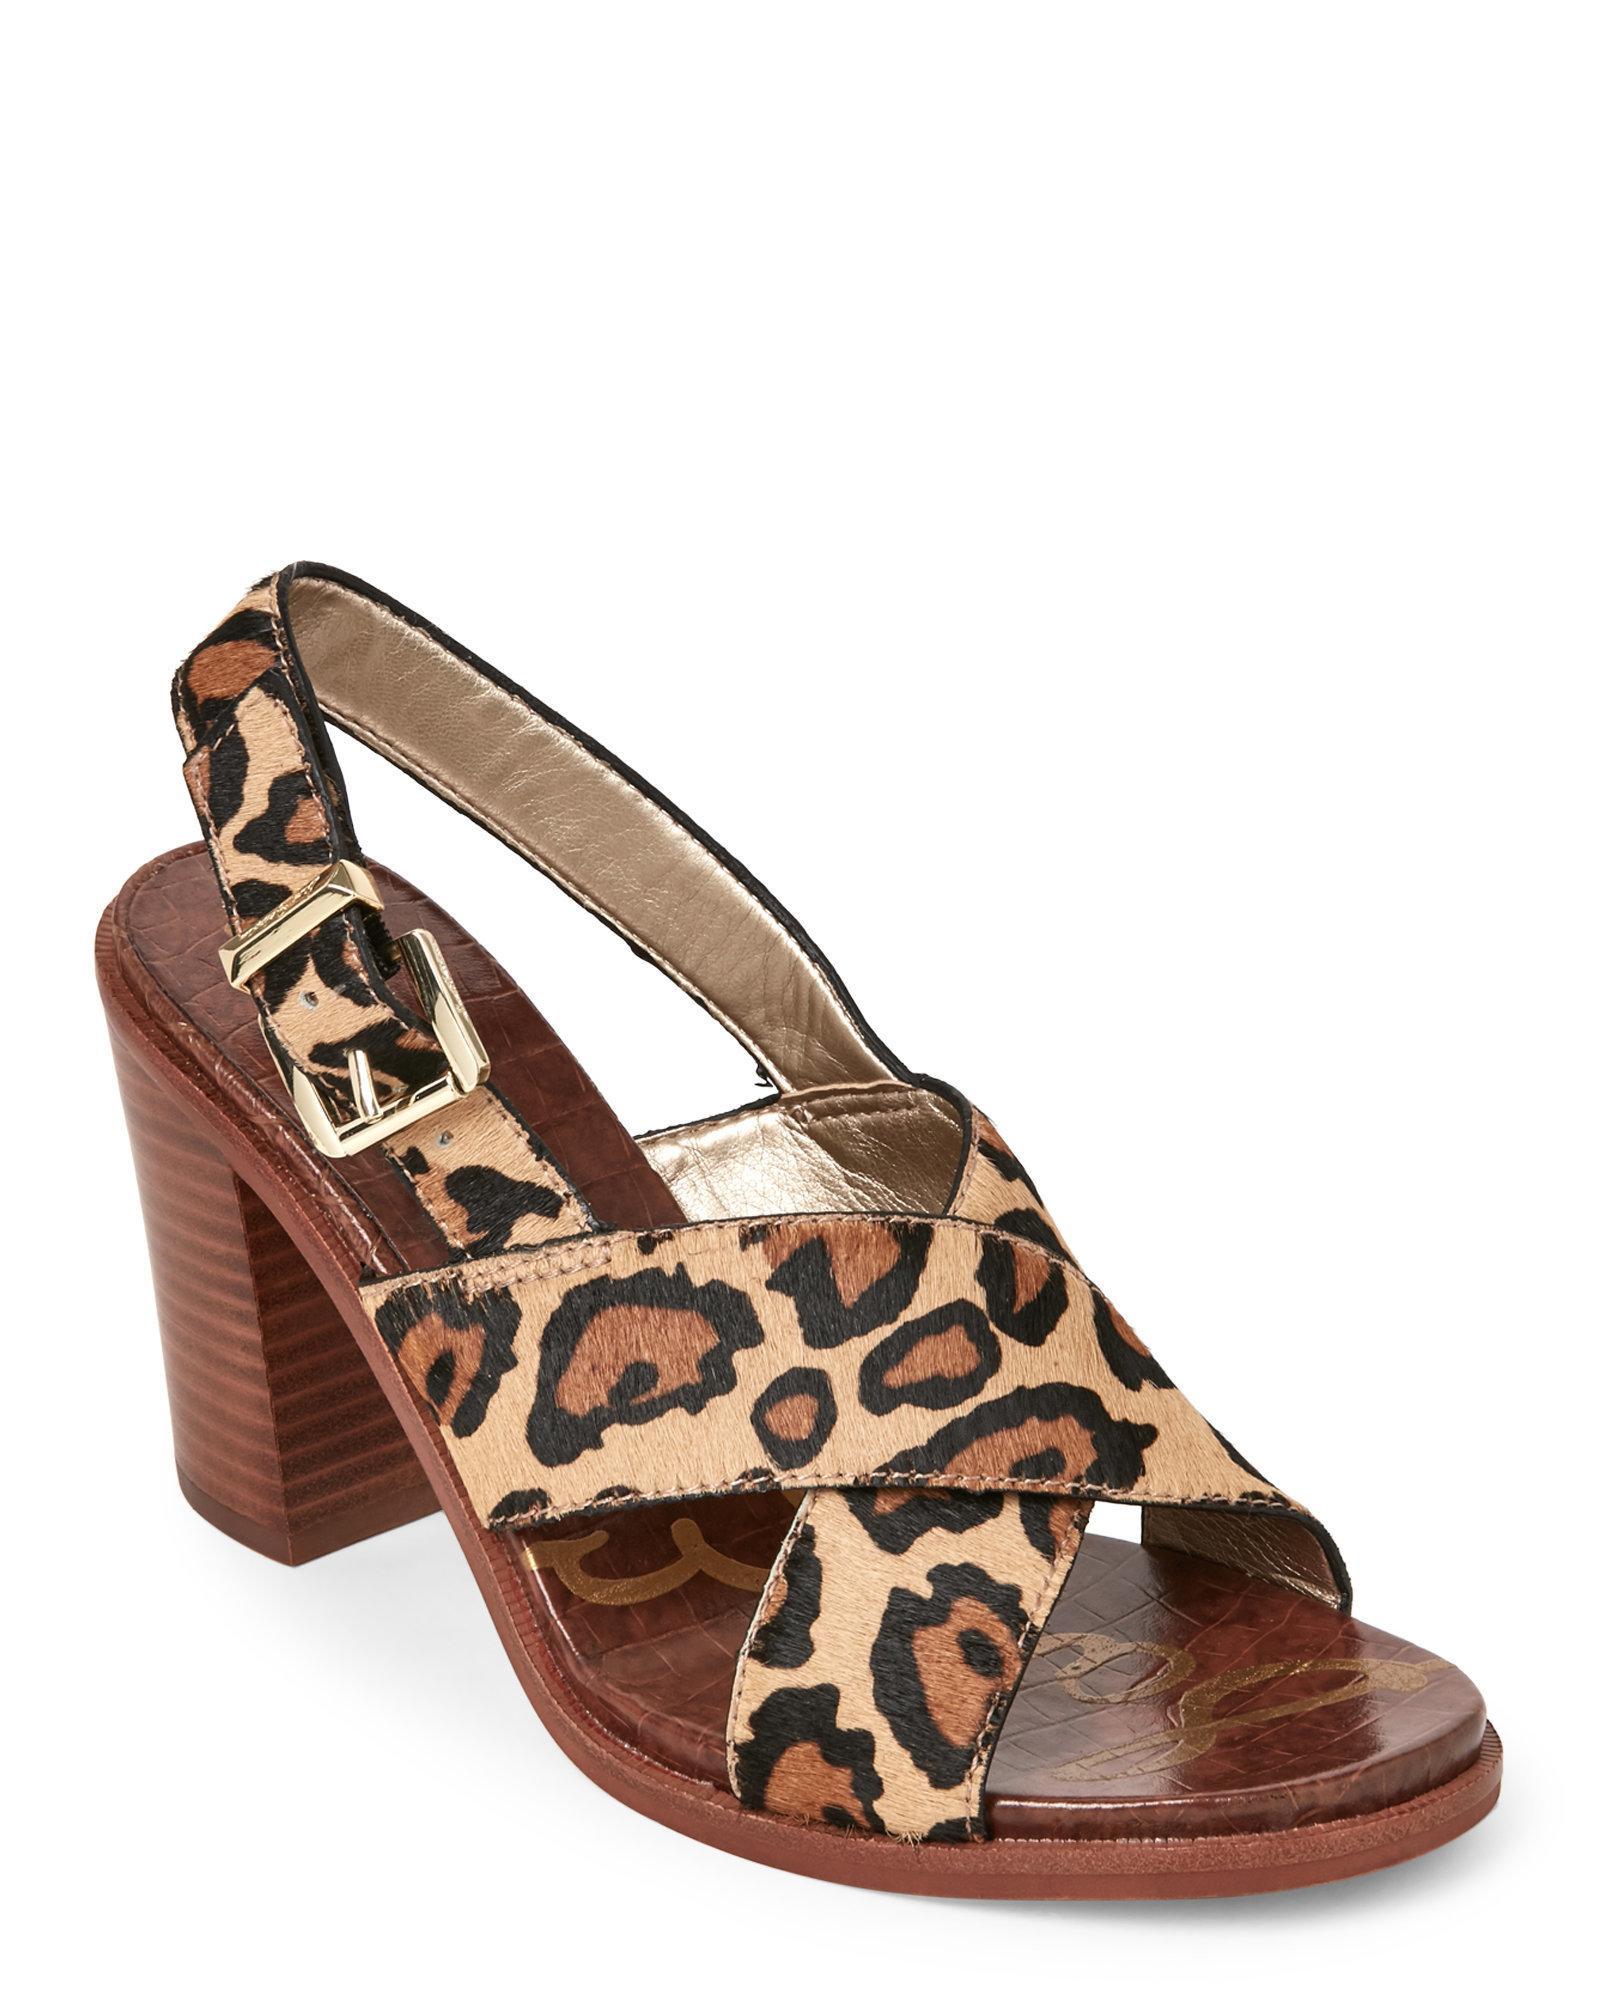 5c307f1e64216 Lyst - Sam Edelman Leopard Ivy Block Heel Slingback Sandals in Brown